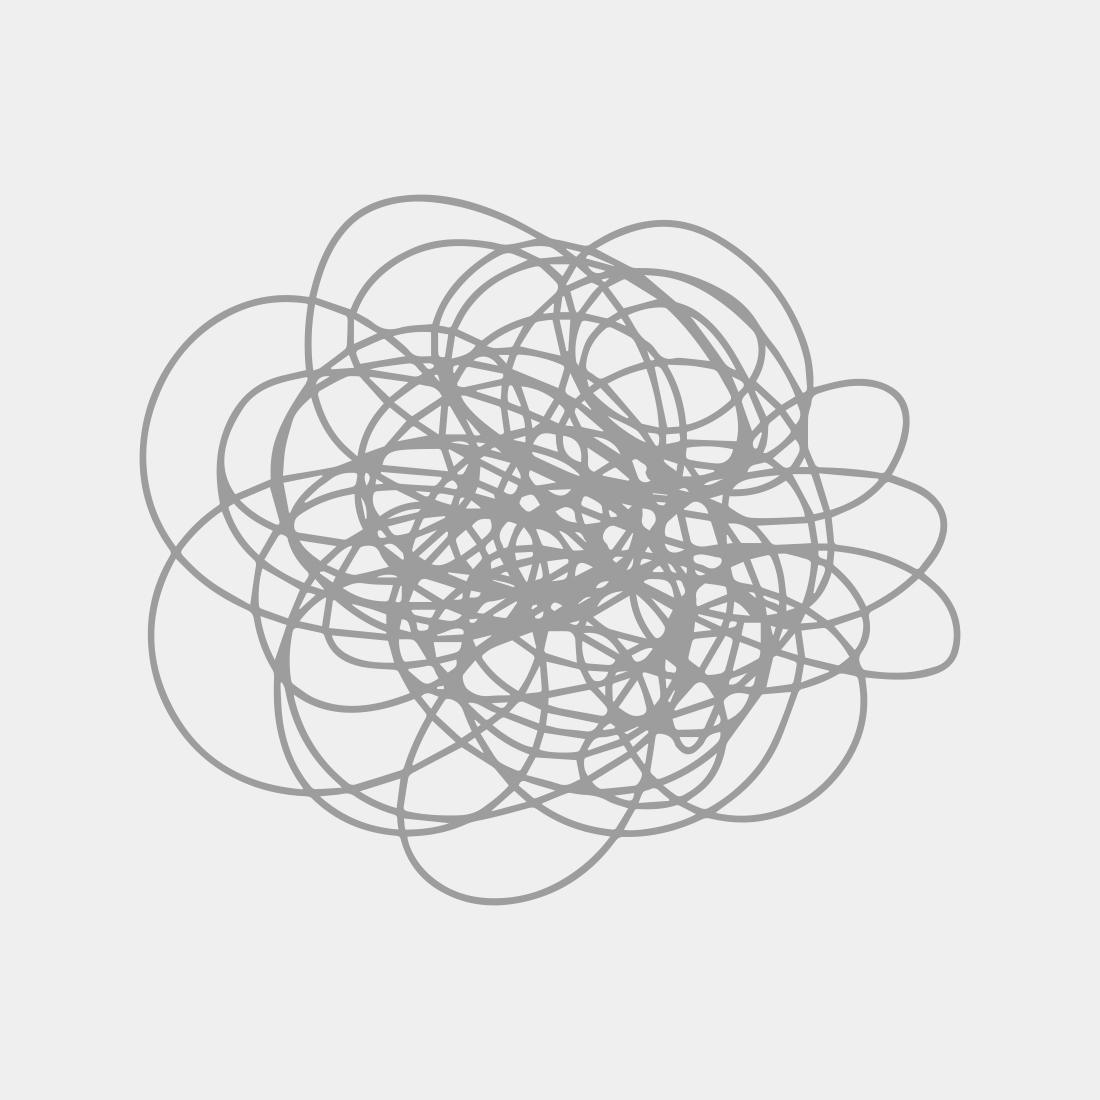 Royal Academy Christmas Cards